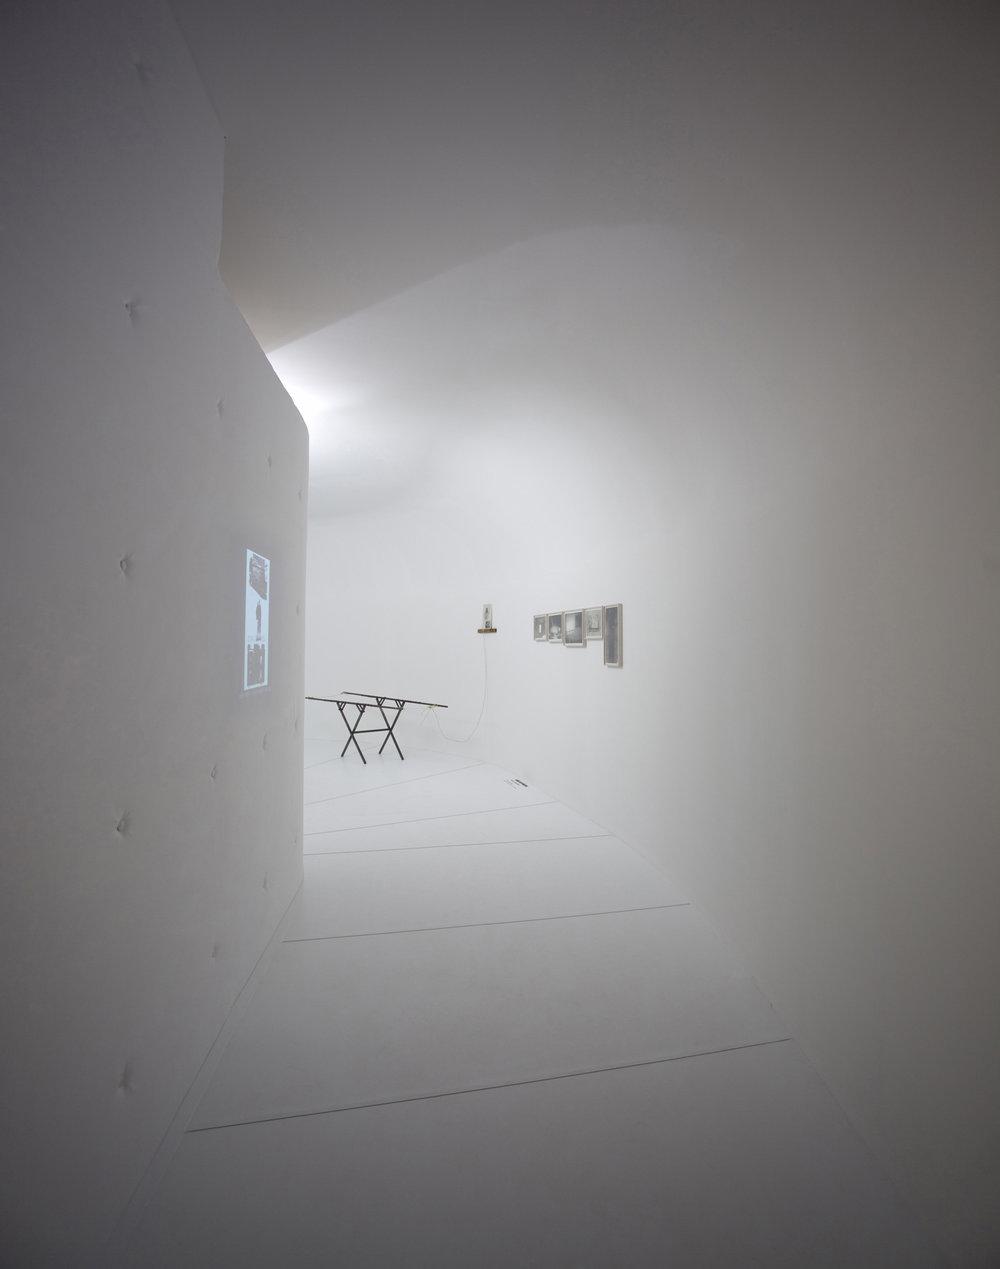 san diego modern architecture, ramiro losada amor, alberto garcia 06.jpg